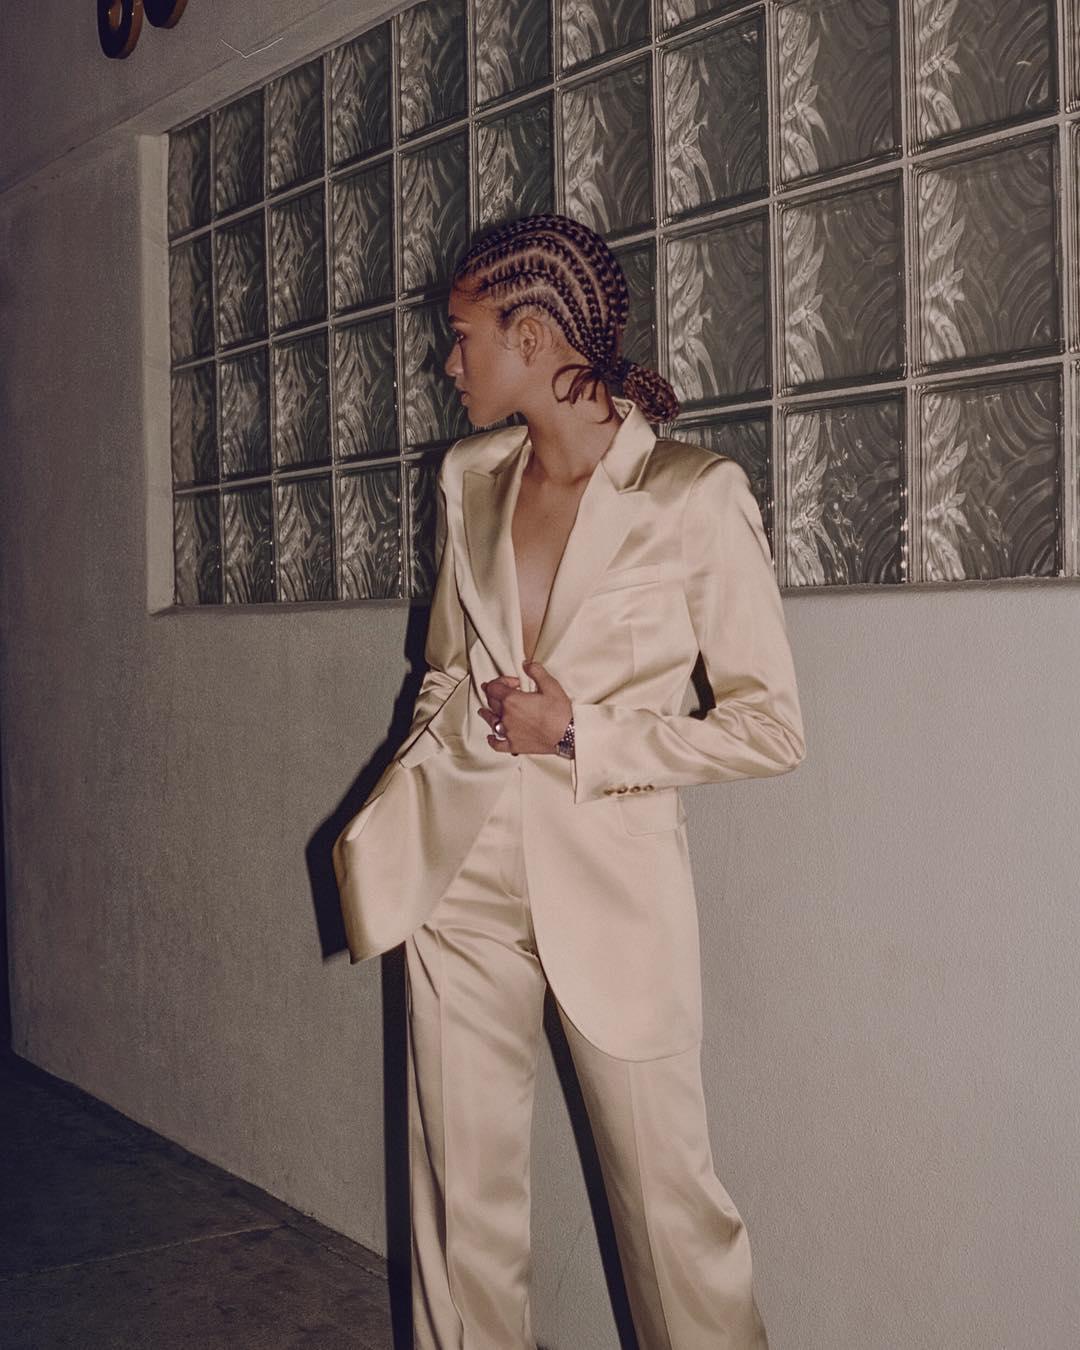 Zendaya - Vogue USA March 2019